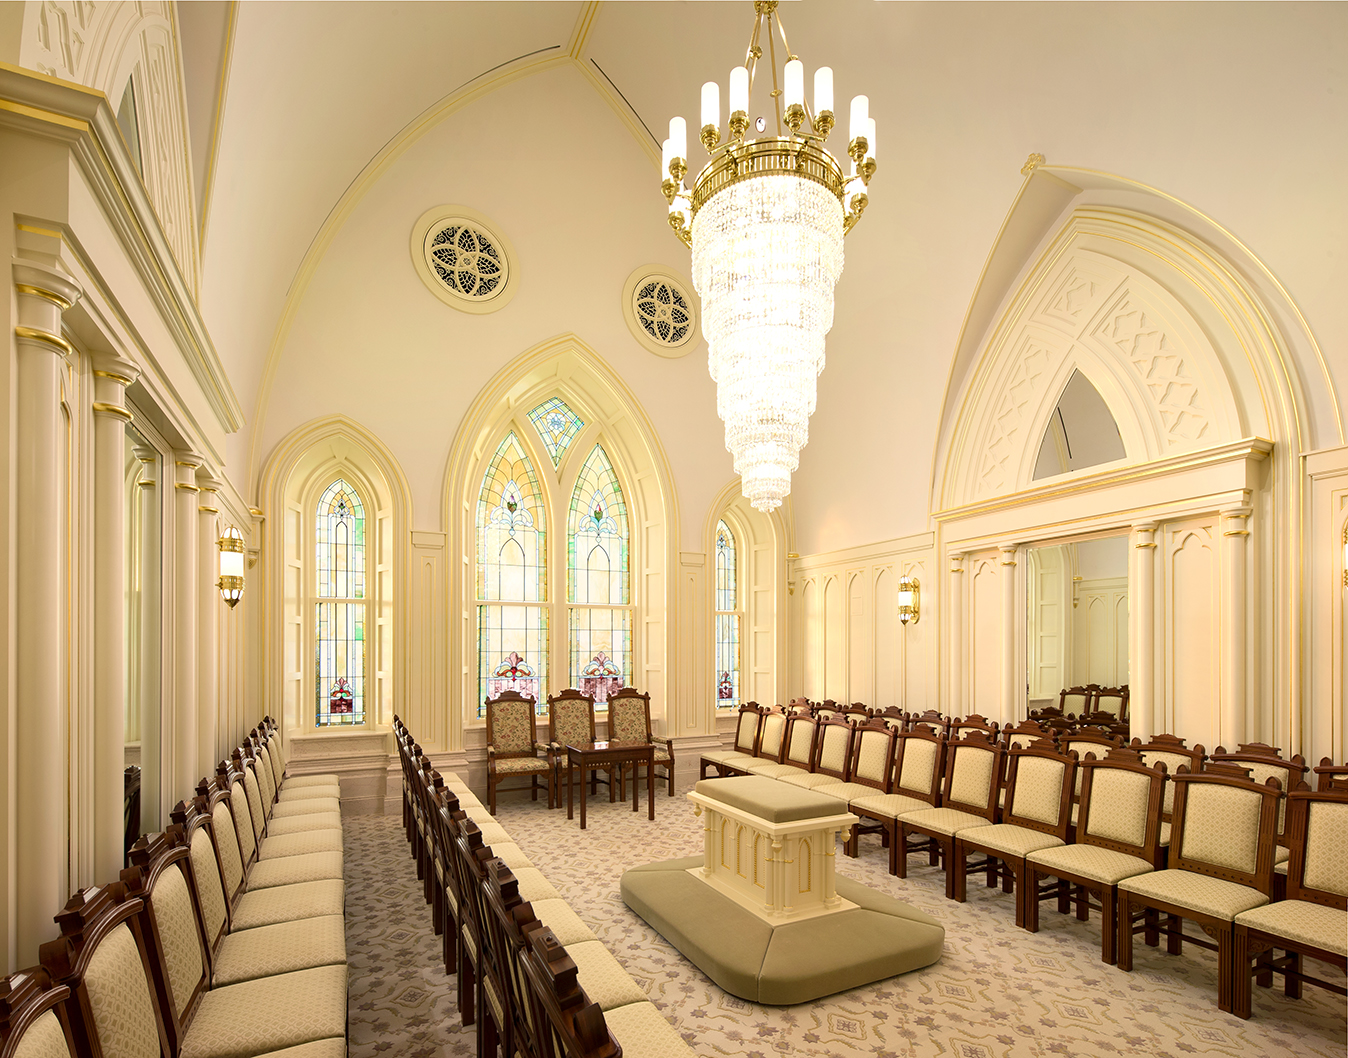 Mormon church releases first interior photos of Provo City ...